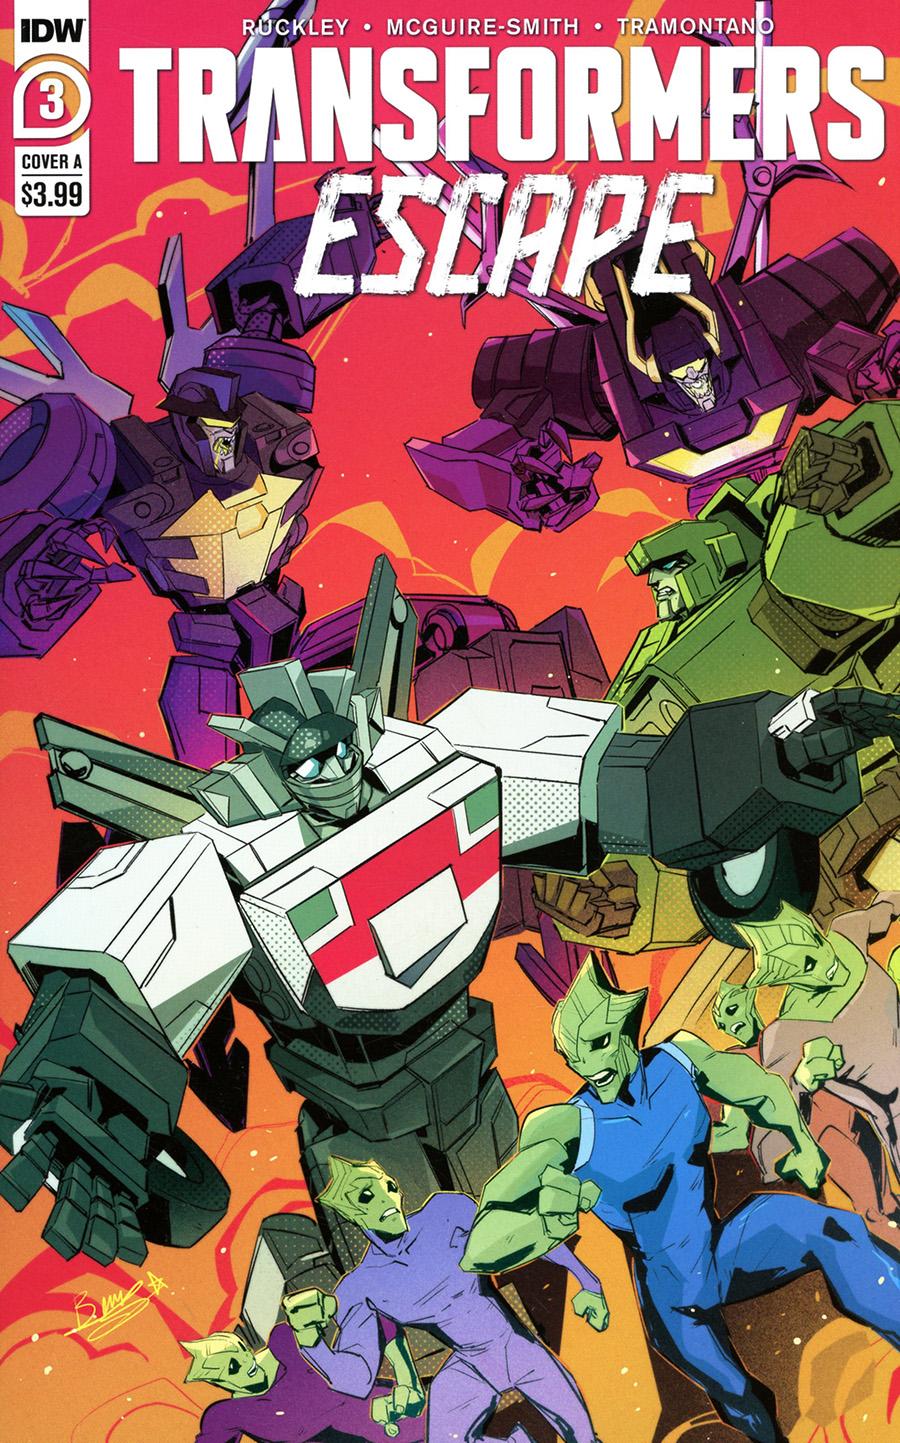 Transformers Escape #3 Cover A Regular Beth McGuire-Smith Cover